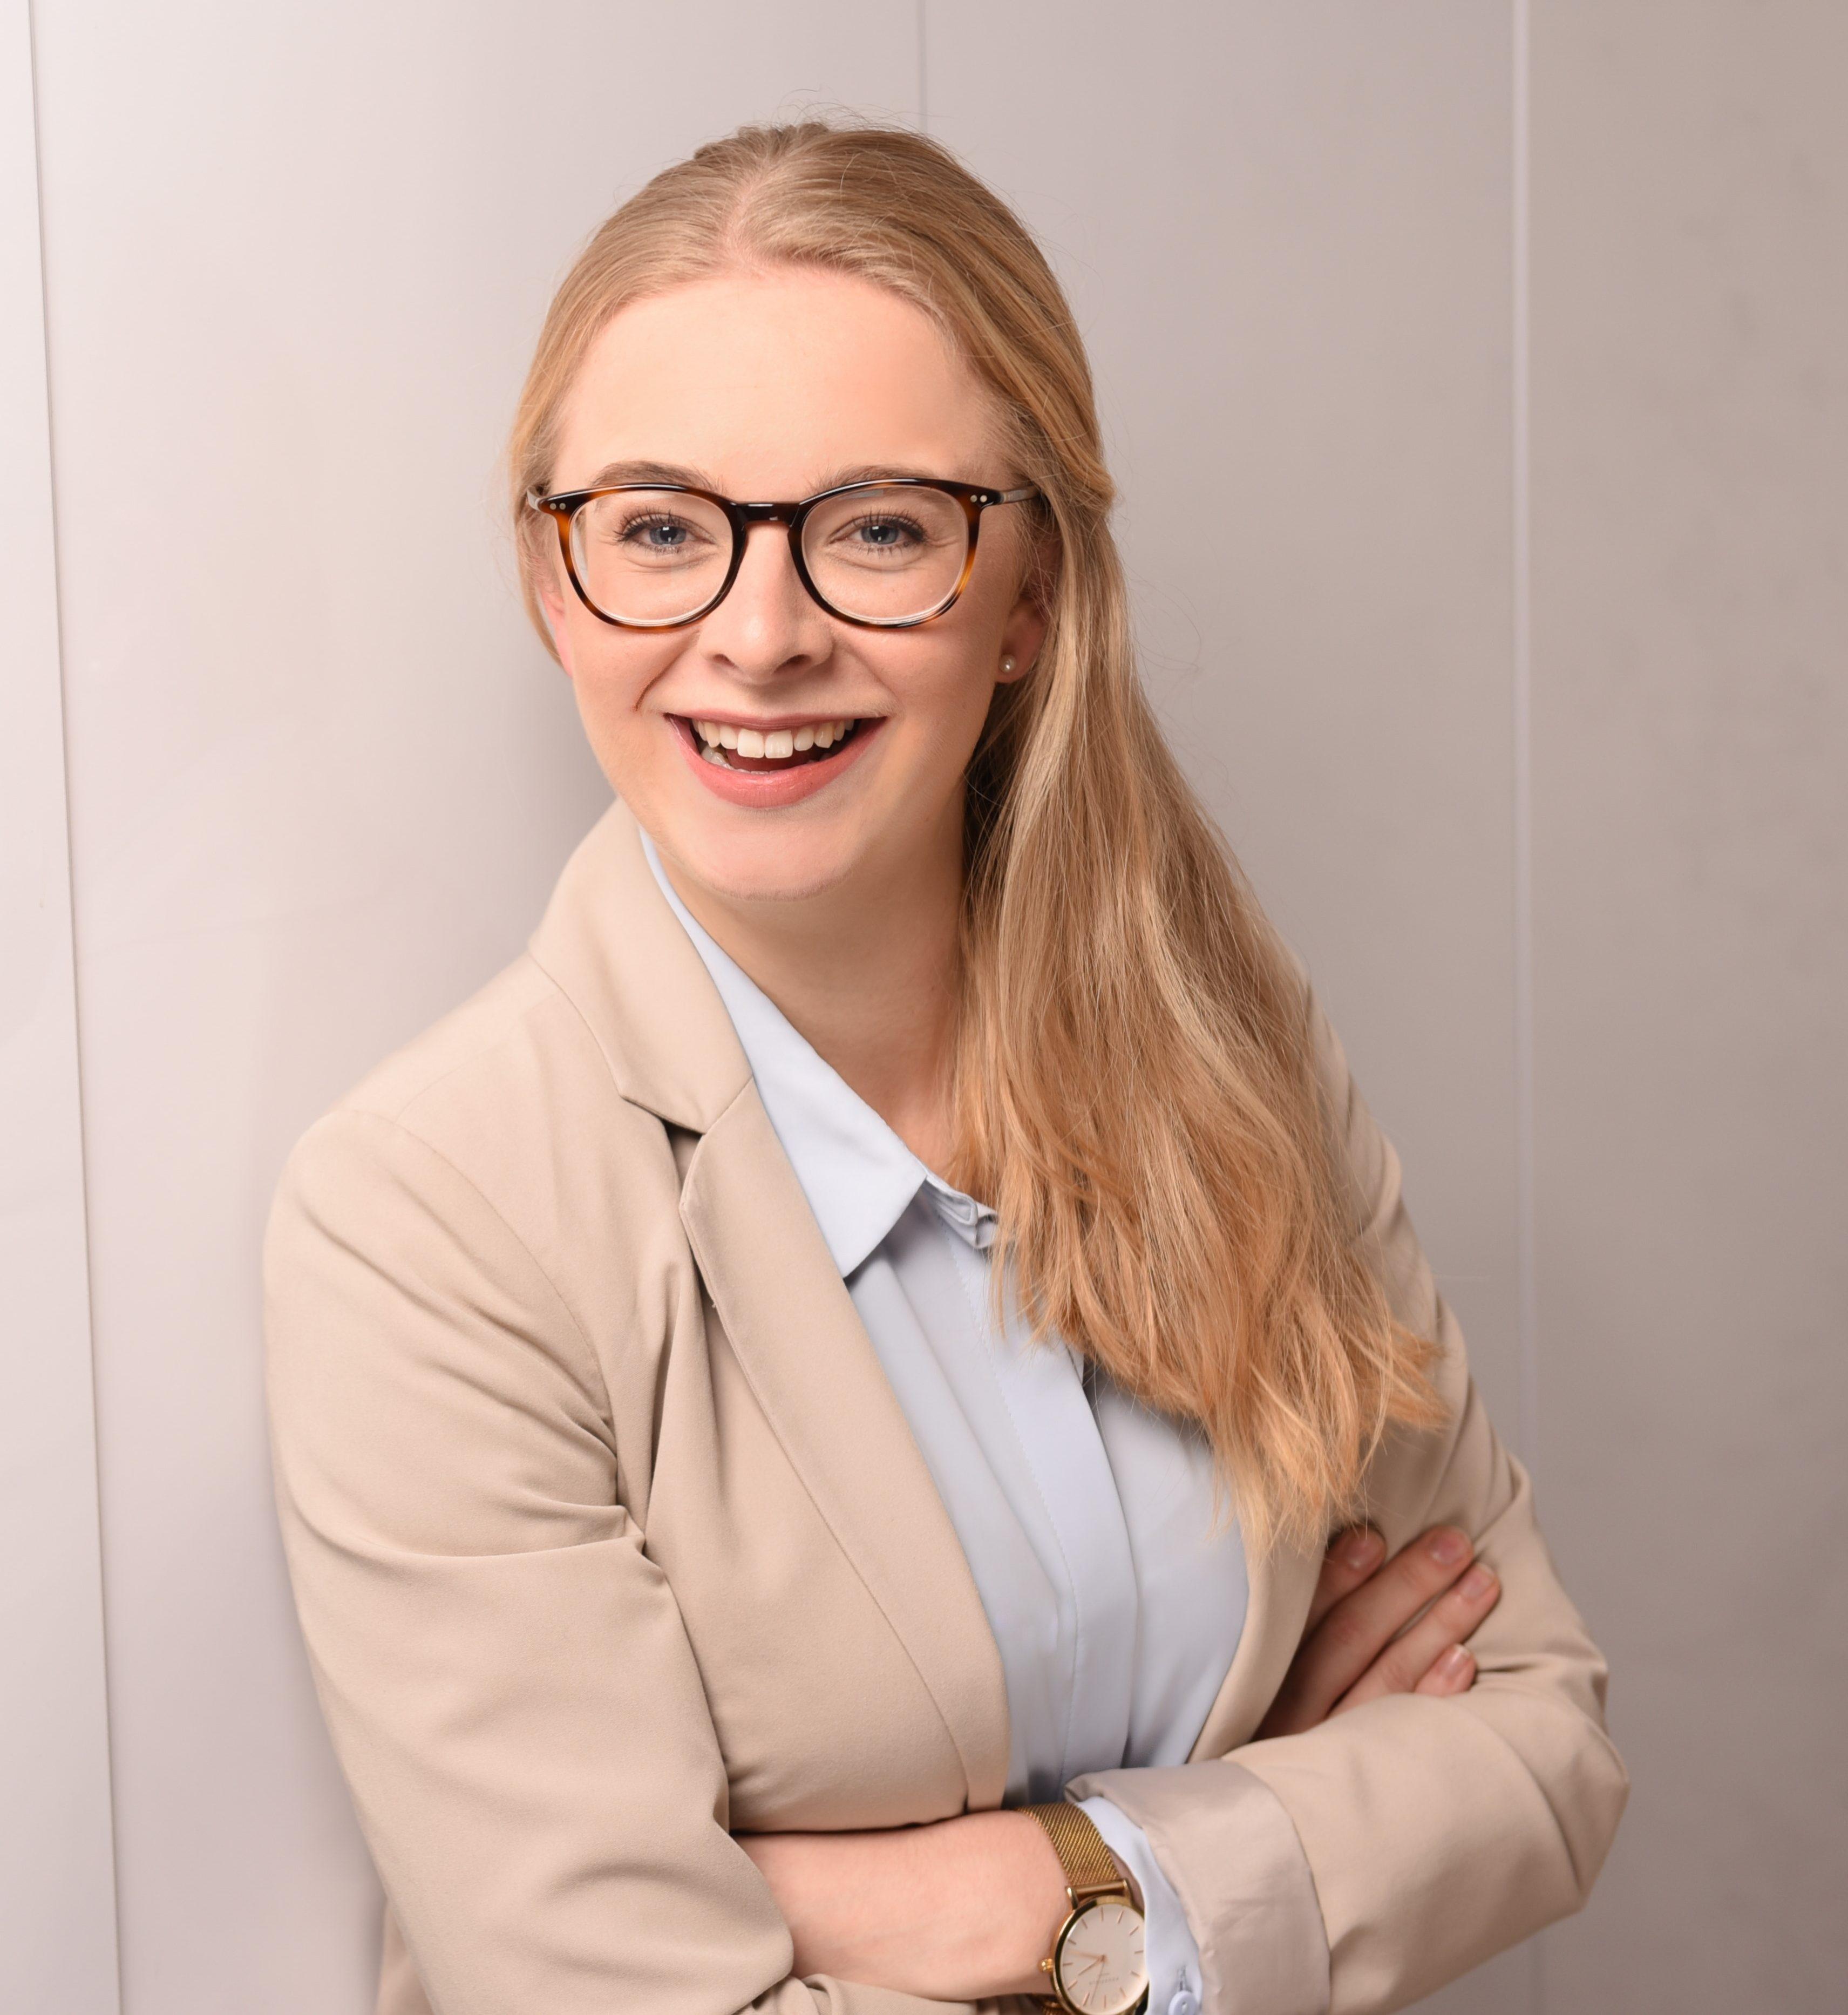 Sophie Lampé stellvertretende Vorstandsvorsitzende des BBGM e. V.